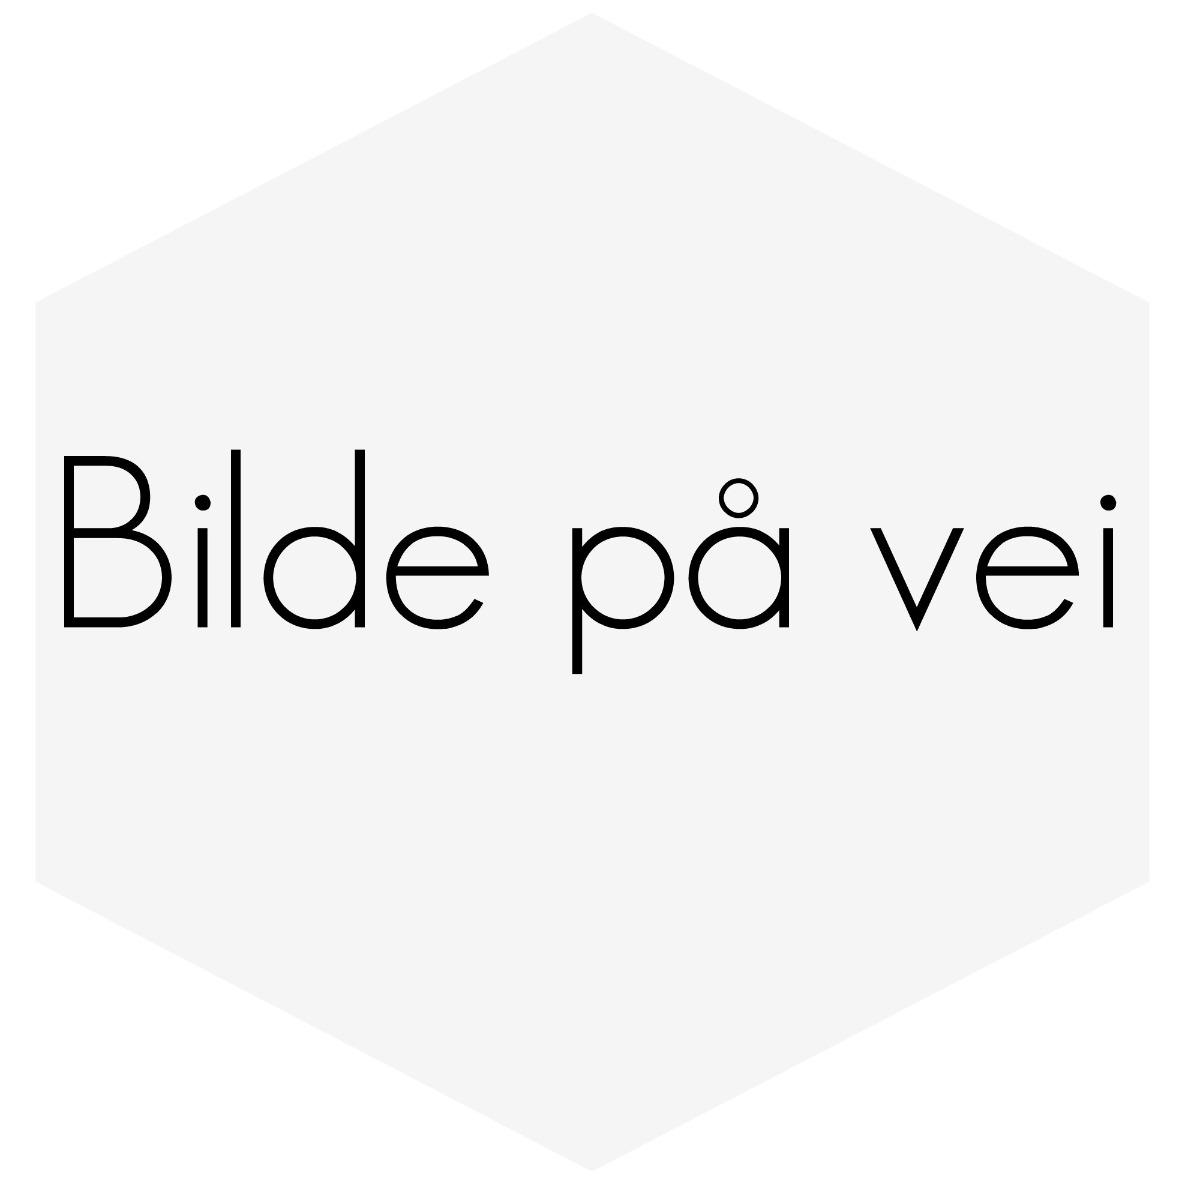 DØRHÅNDTAK UTVENDIG 740/940  CROM/SORT HØYRE 6846645